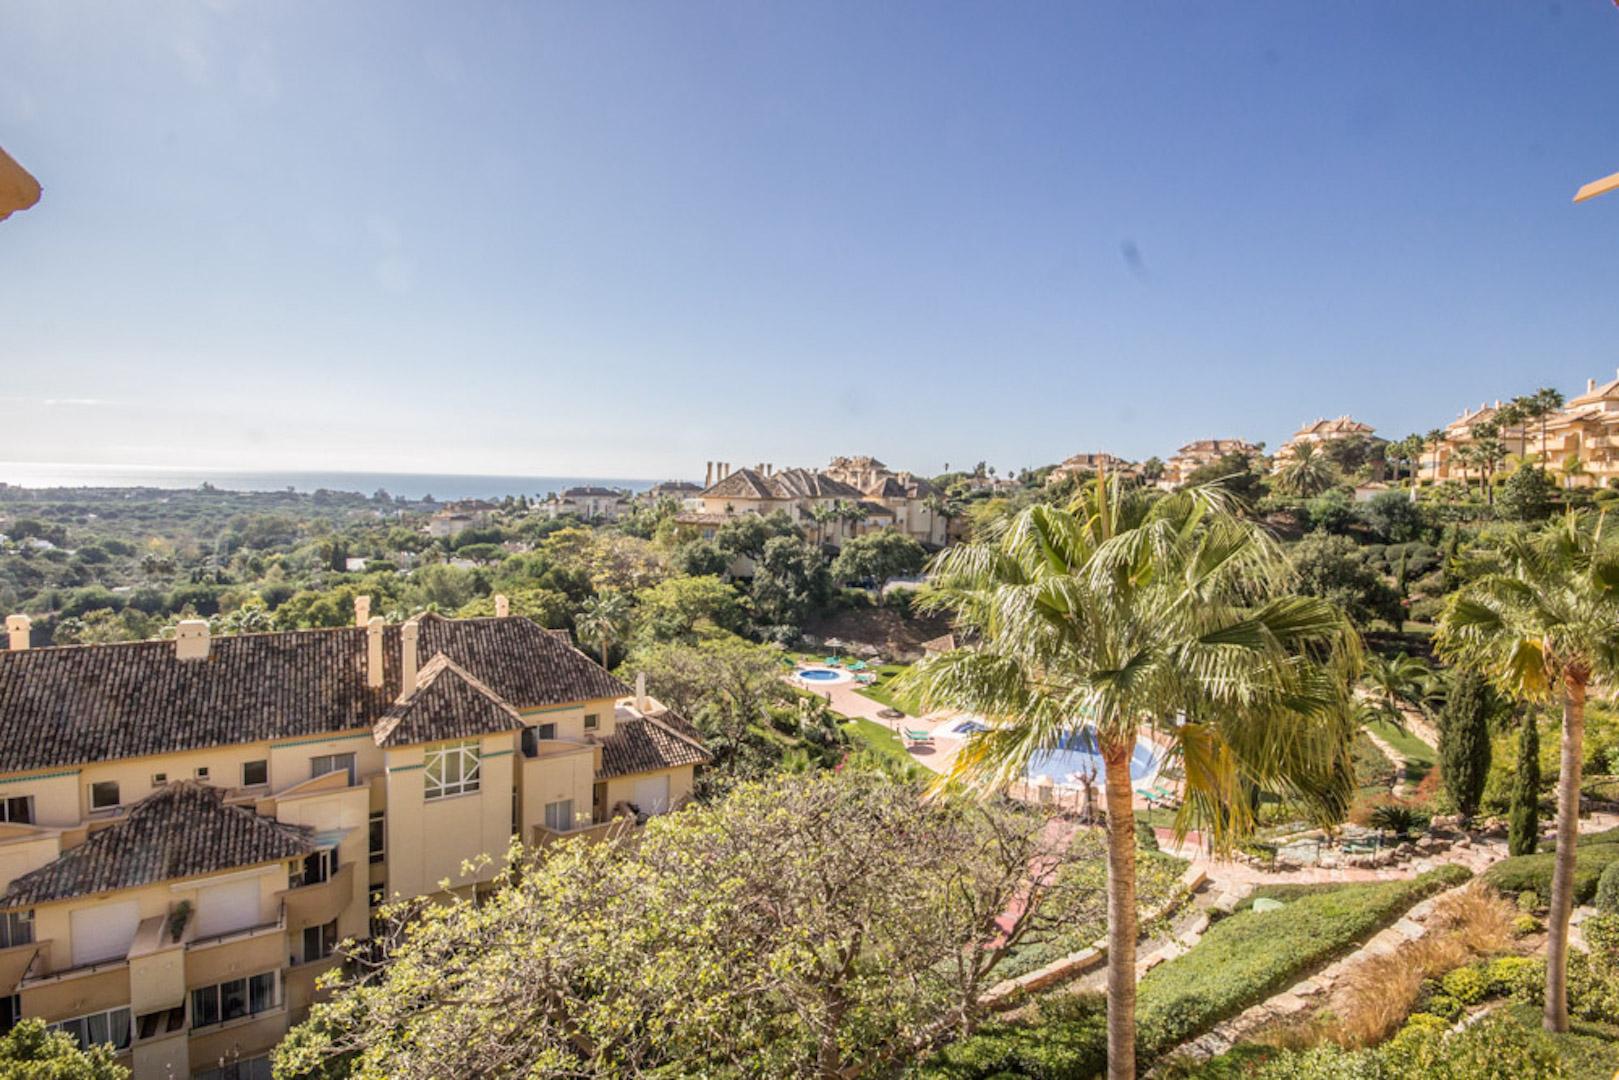 2 bedroom apartment with panoramic sea views in Elviria Hills